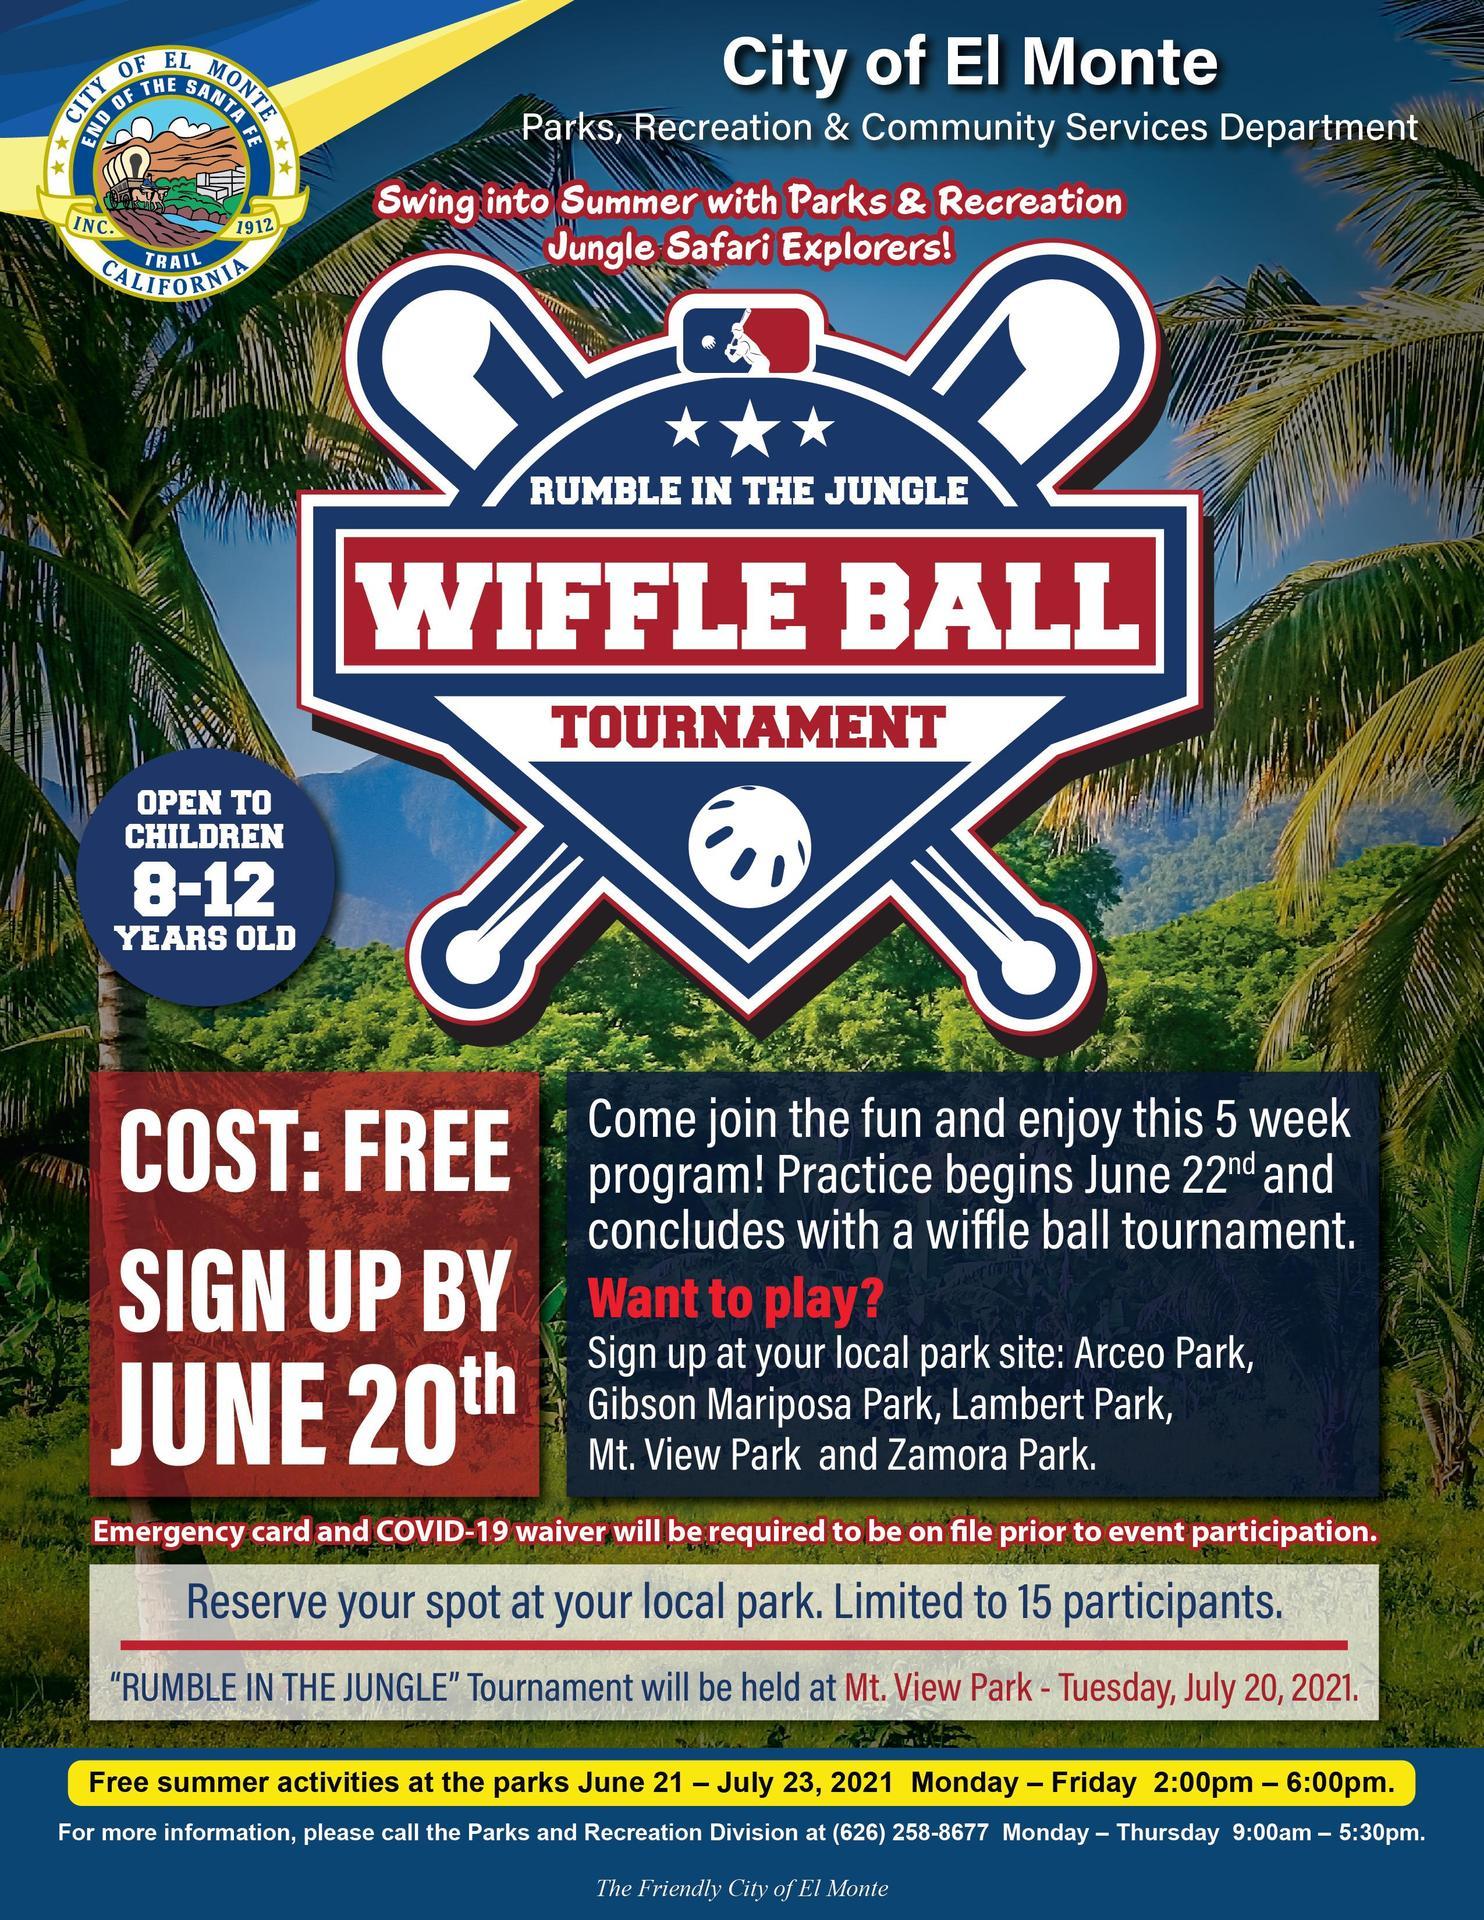 El Monte Wiffle Ball tournament flyer courtesy of city of El Monte